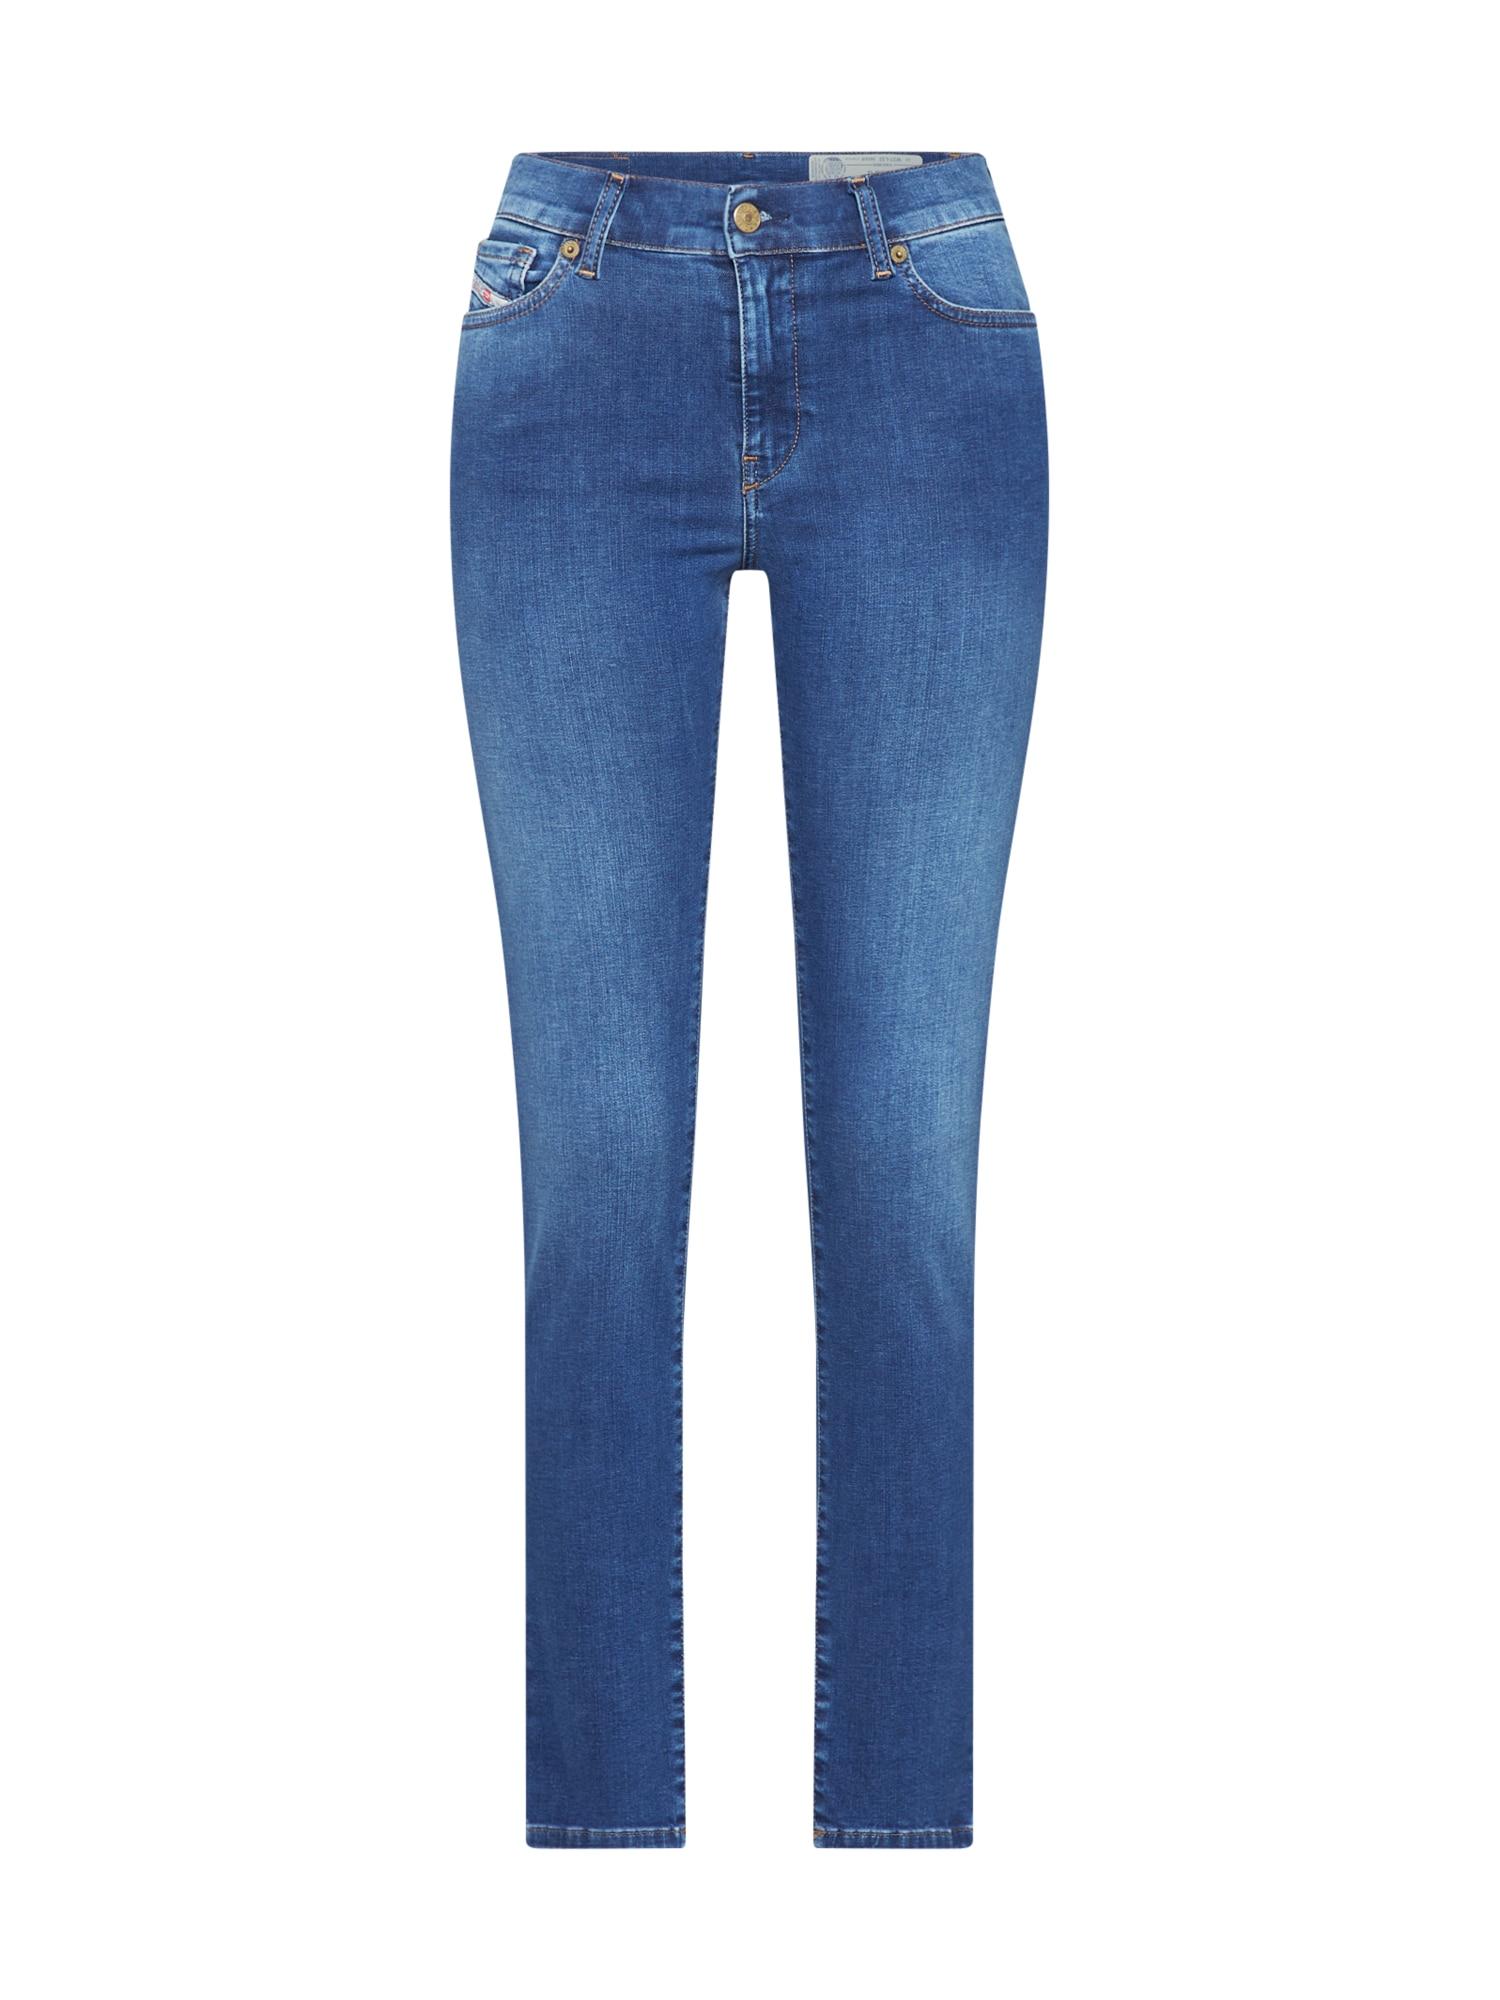 DIESEL Džinsai 'D-ROISIN' tamsiai (džinso) mėlyna